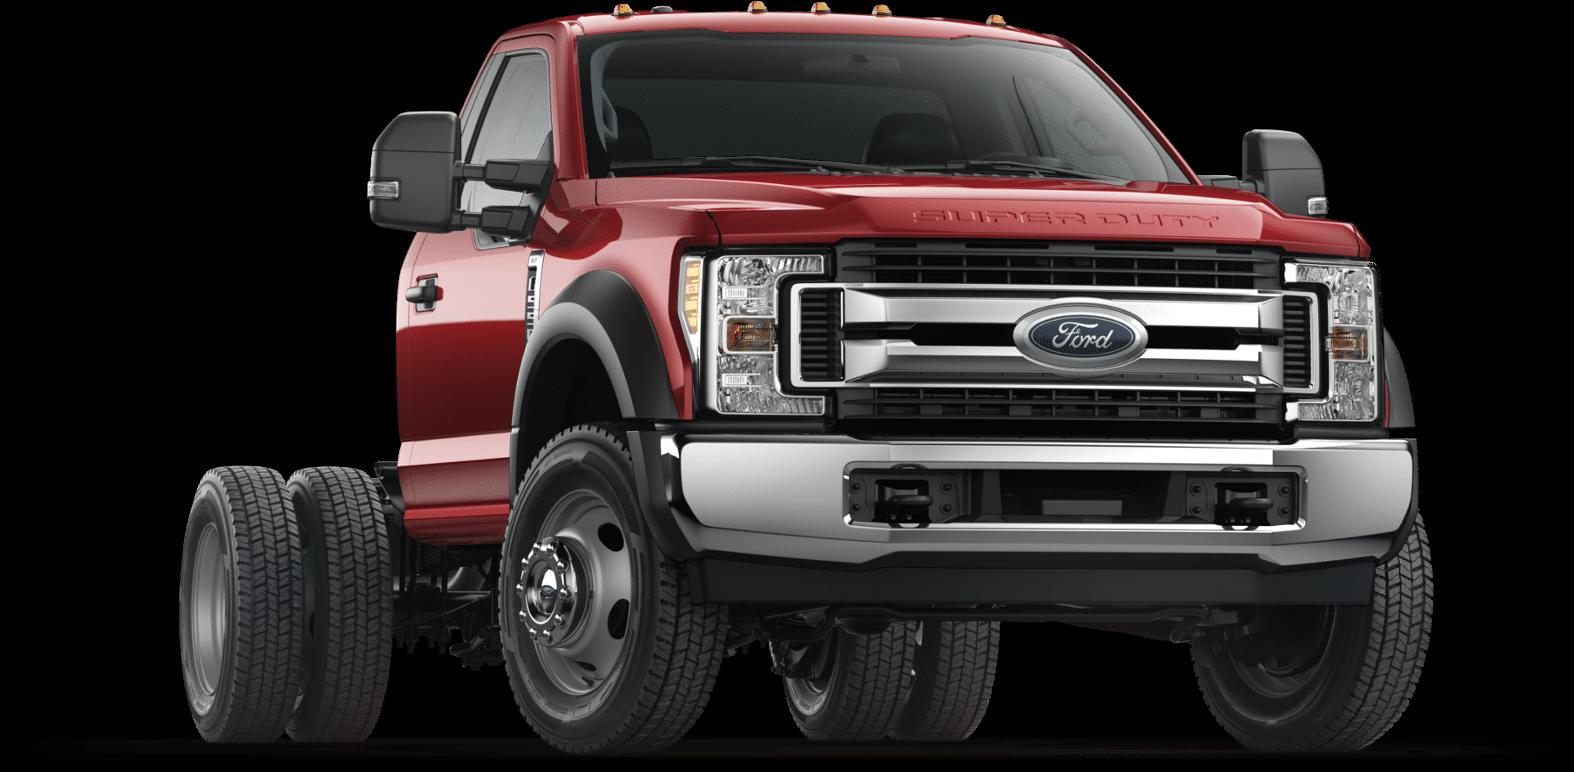 Landi Renzo Secures CNG Certification for 2018 Ford Trucks, Vans